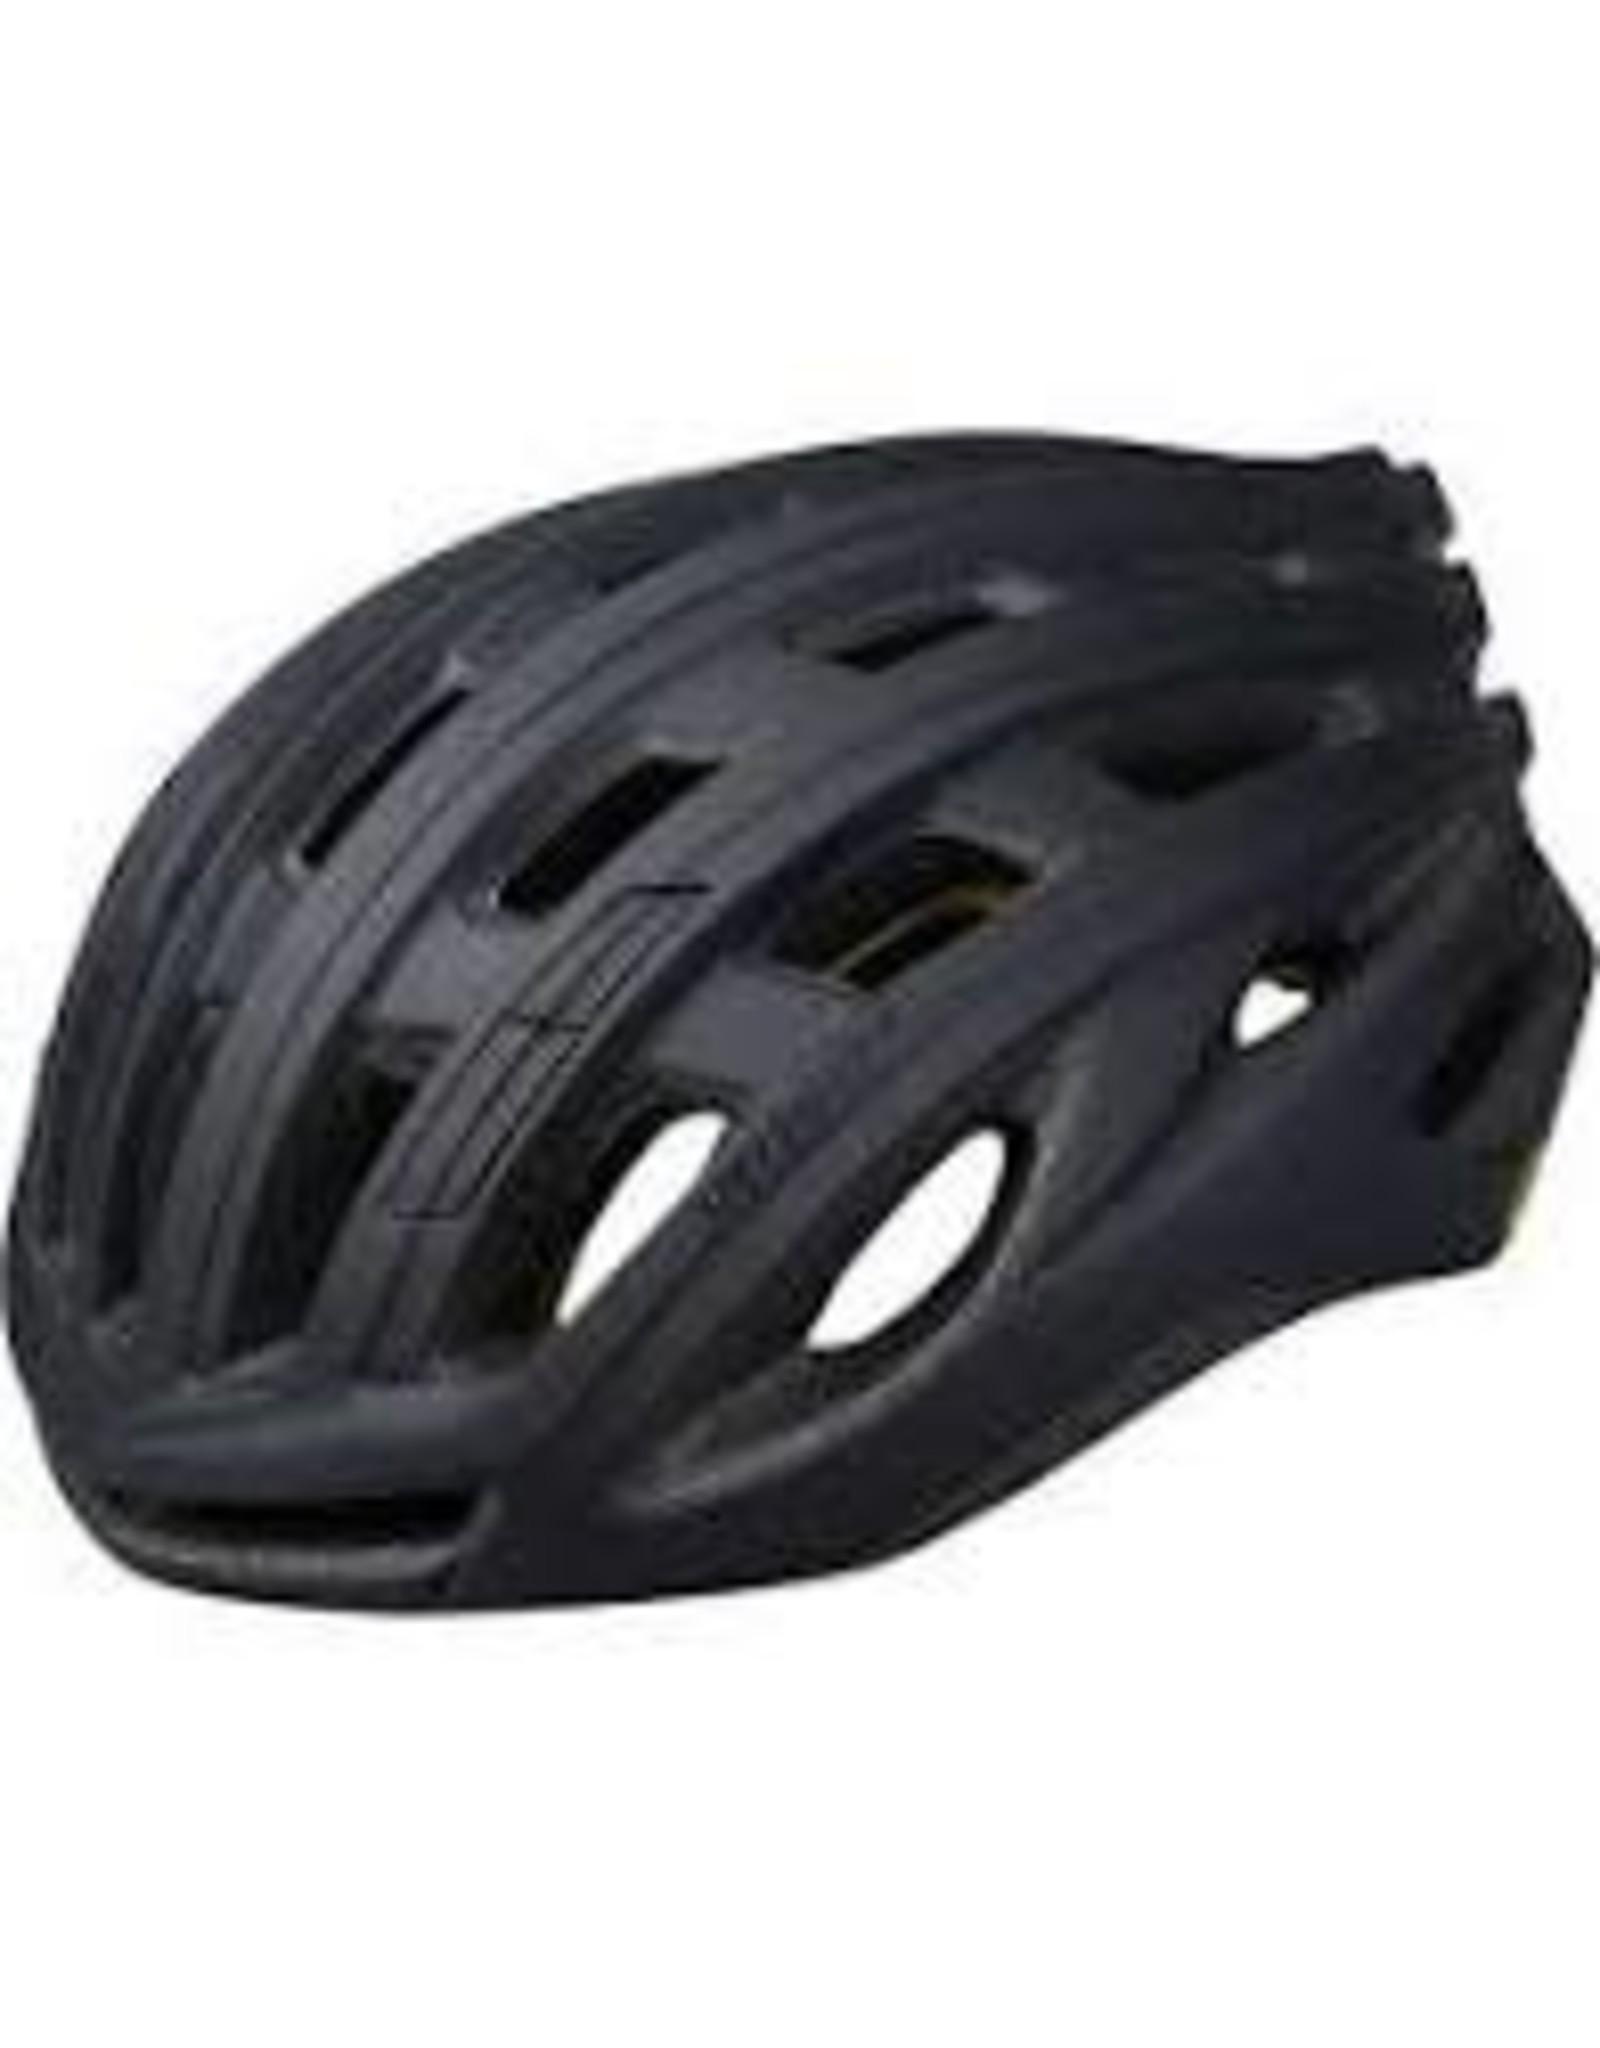 Specialized Helmet Spec Propero 3 ANGI MIPS Blk Med